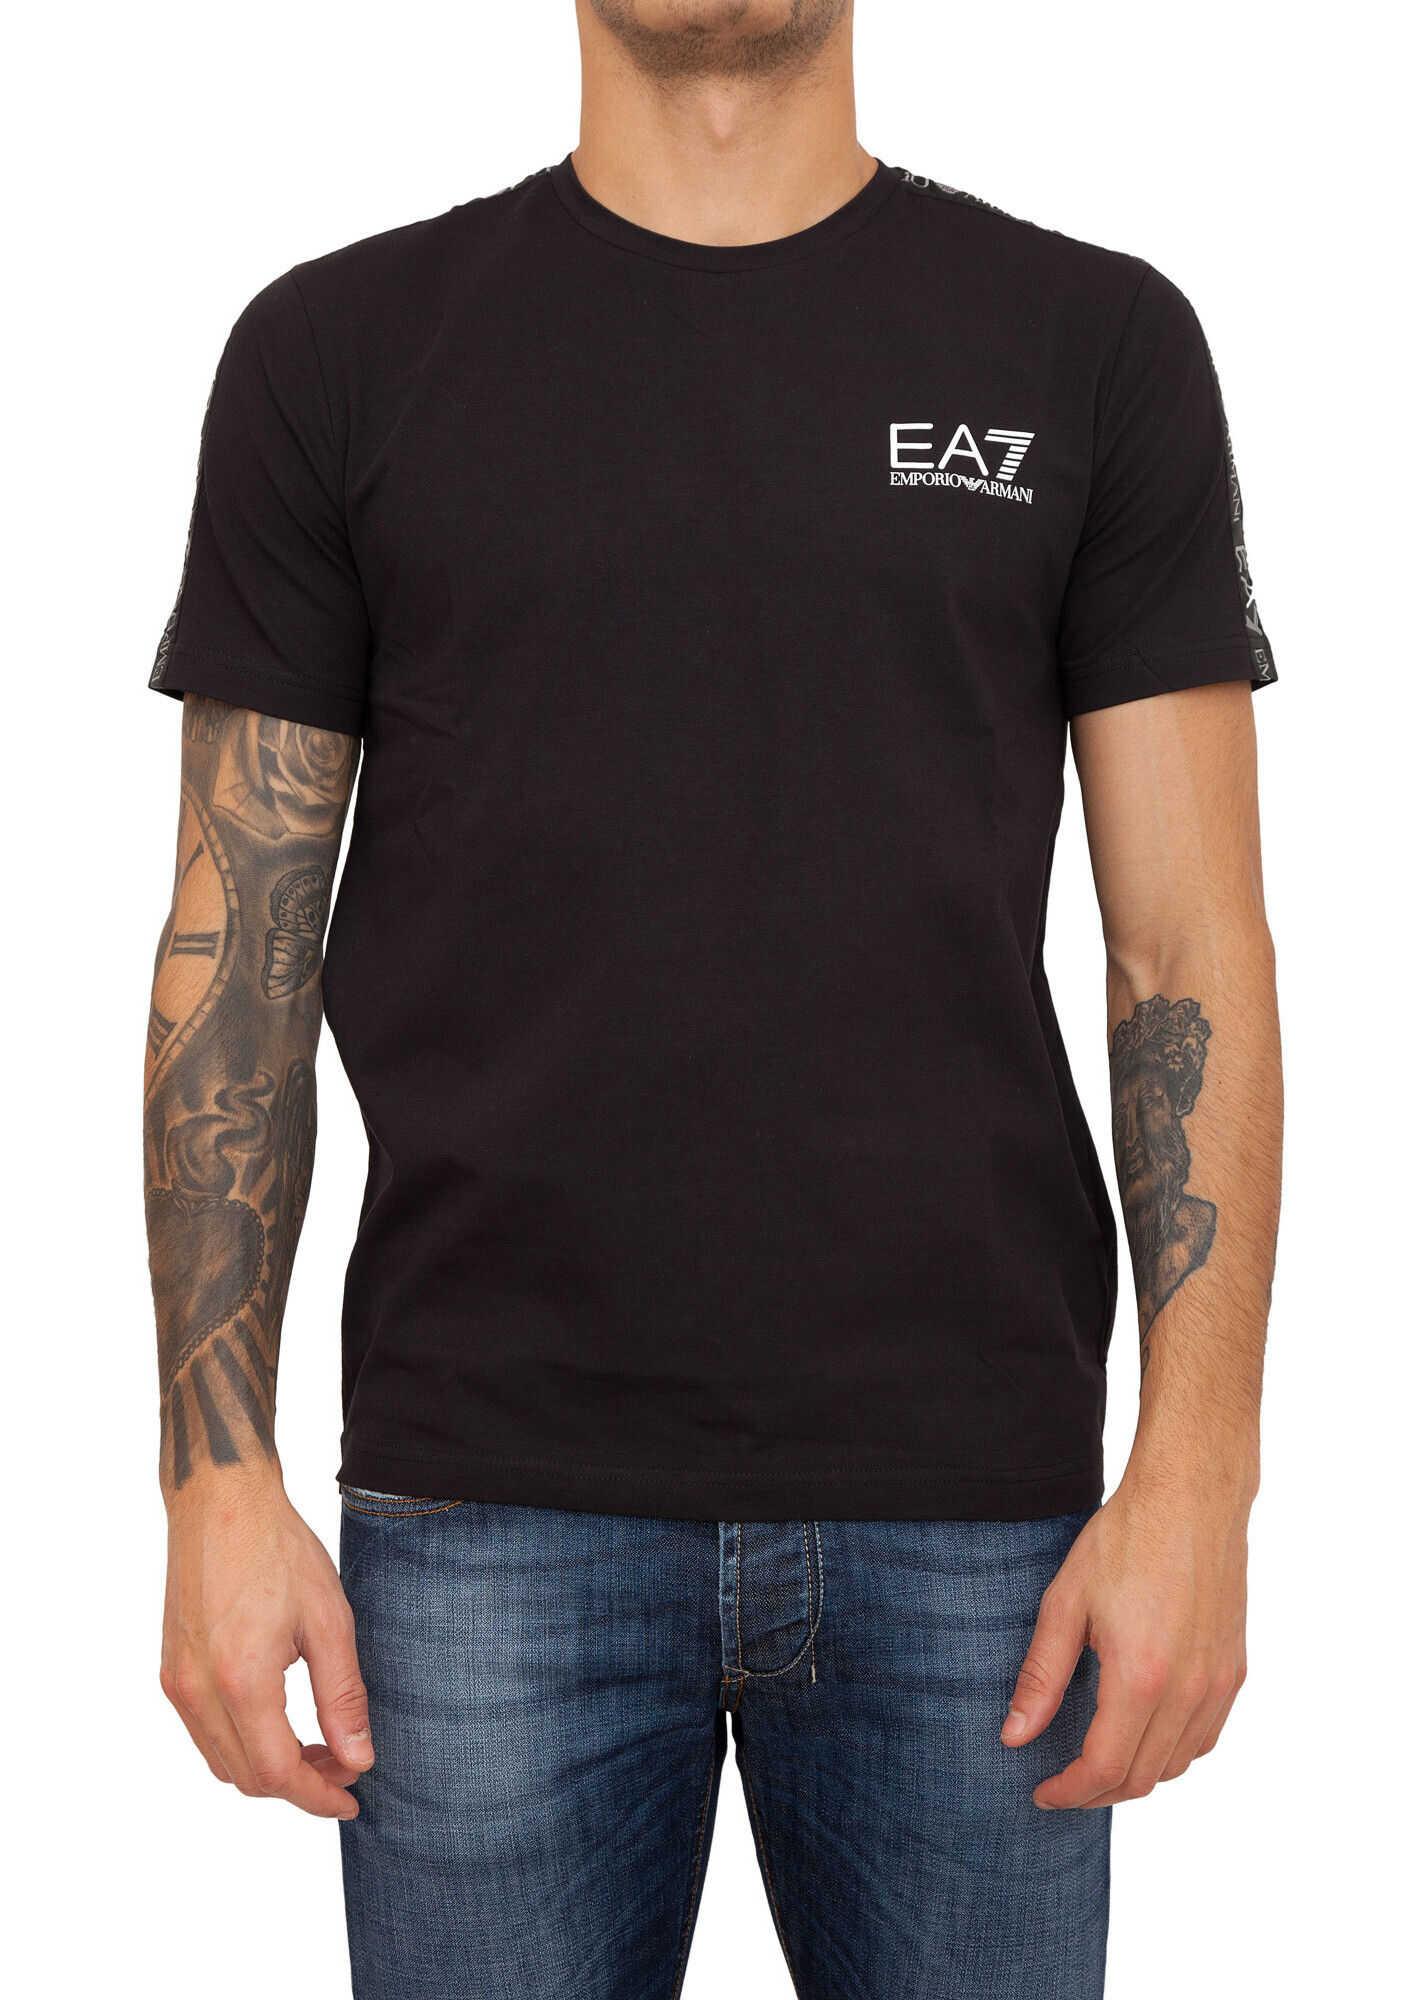 EA7 662702C9 BLACK